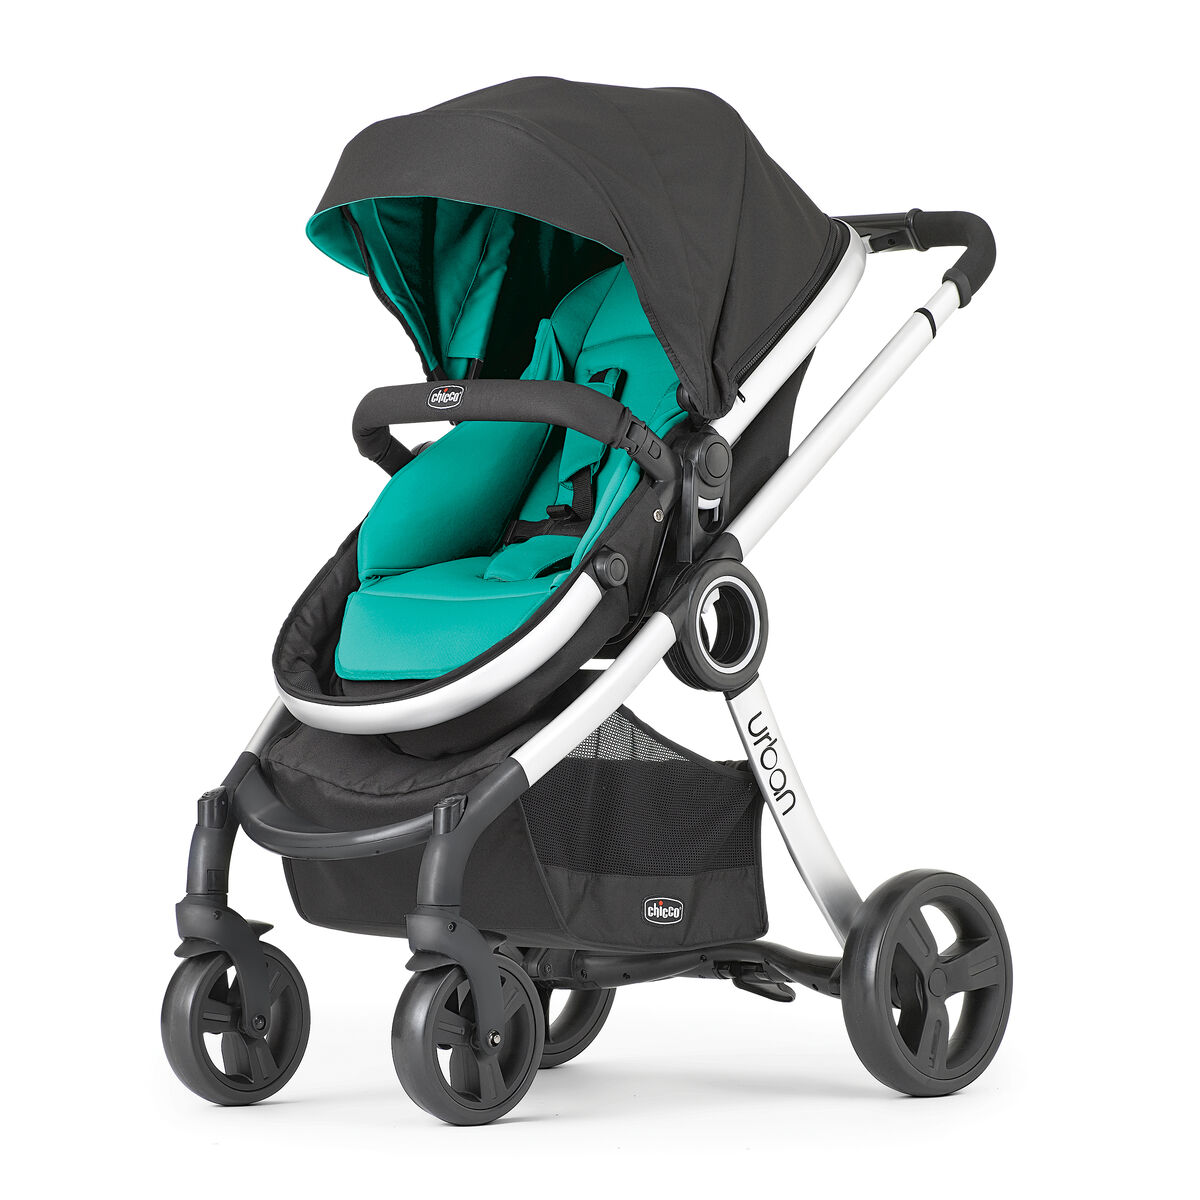 Chicco Chicco Urban 6 In 1 Modular Stroller Emerald